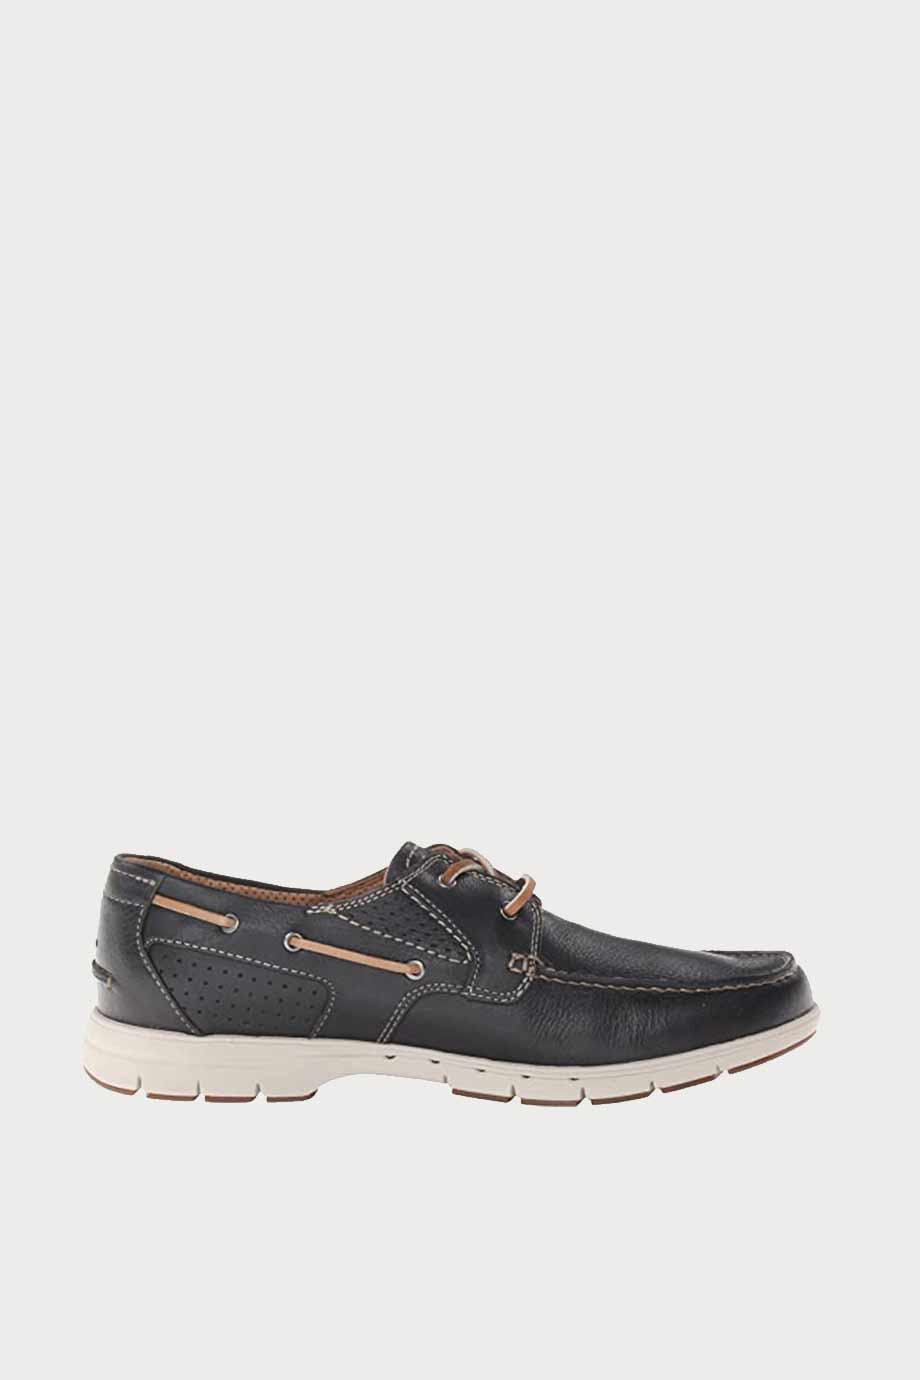 spiridoula metheniti shoes xalkida p Unnautical Sea clarks navy leather 2